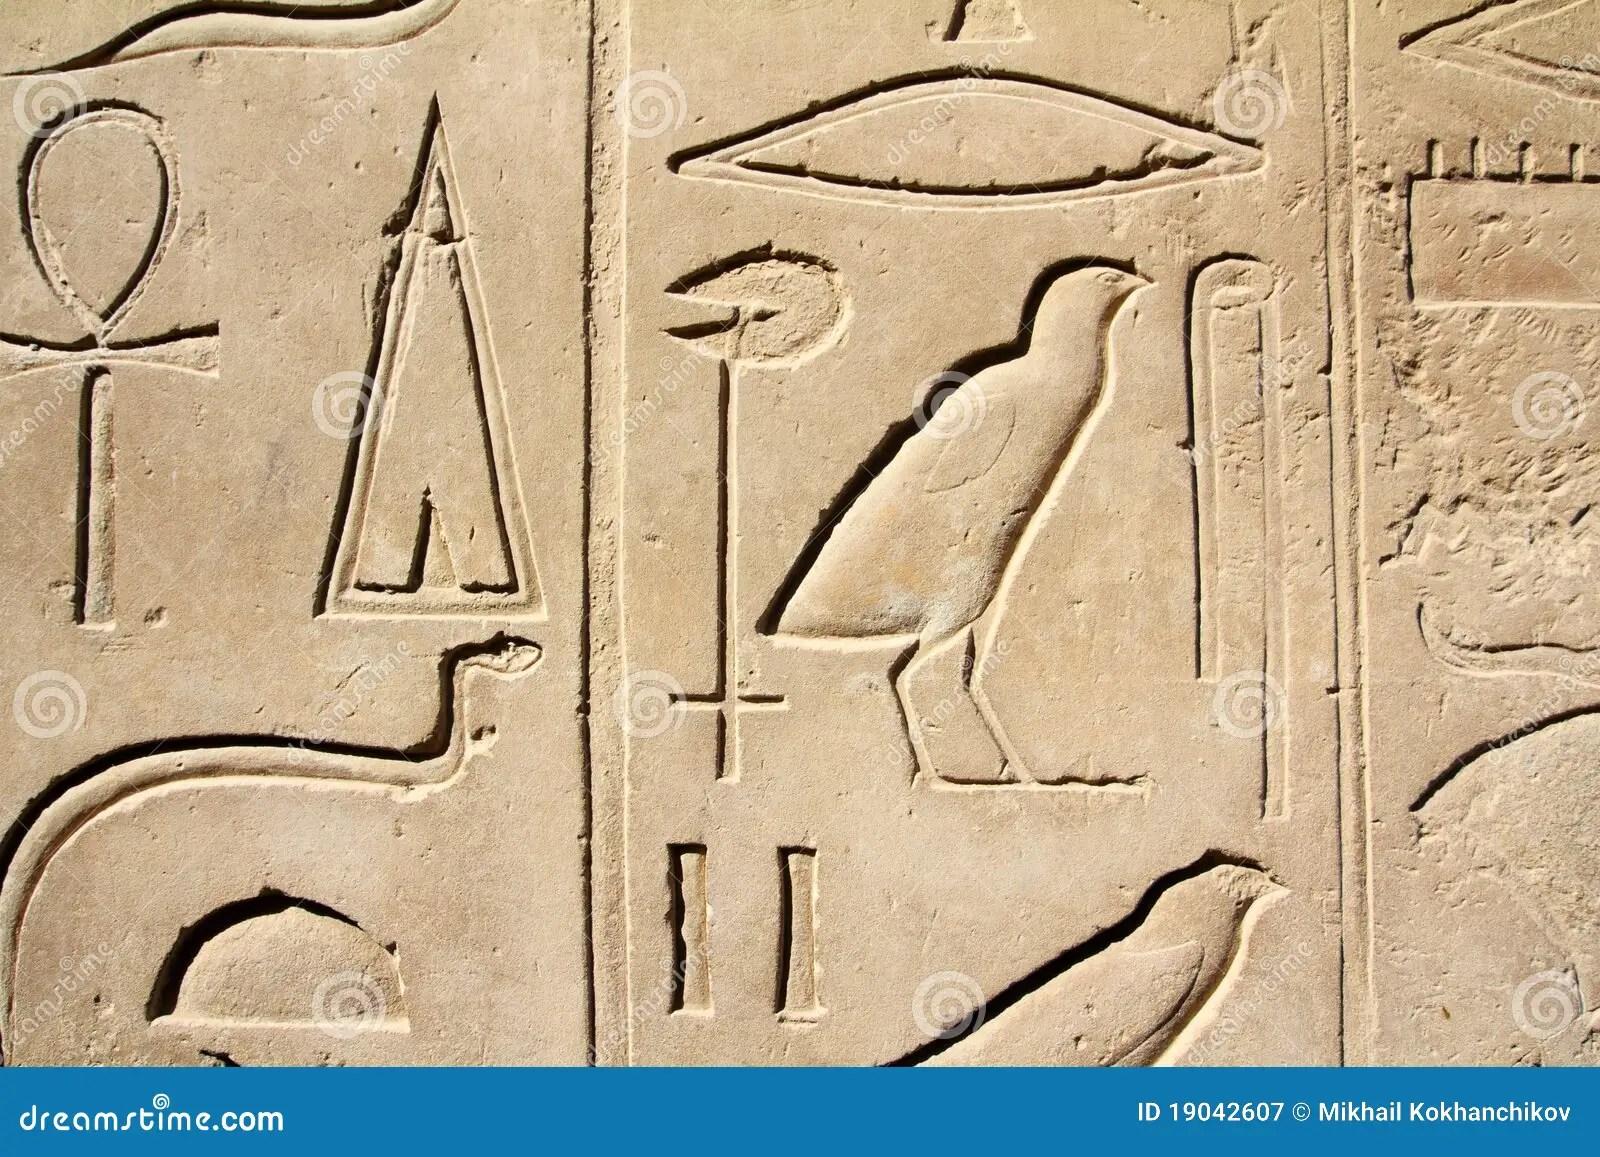 Images Of Hieroglyphics